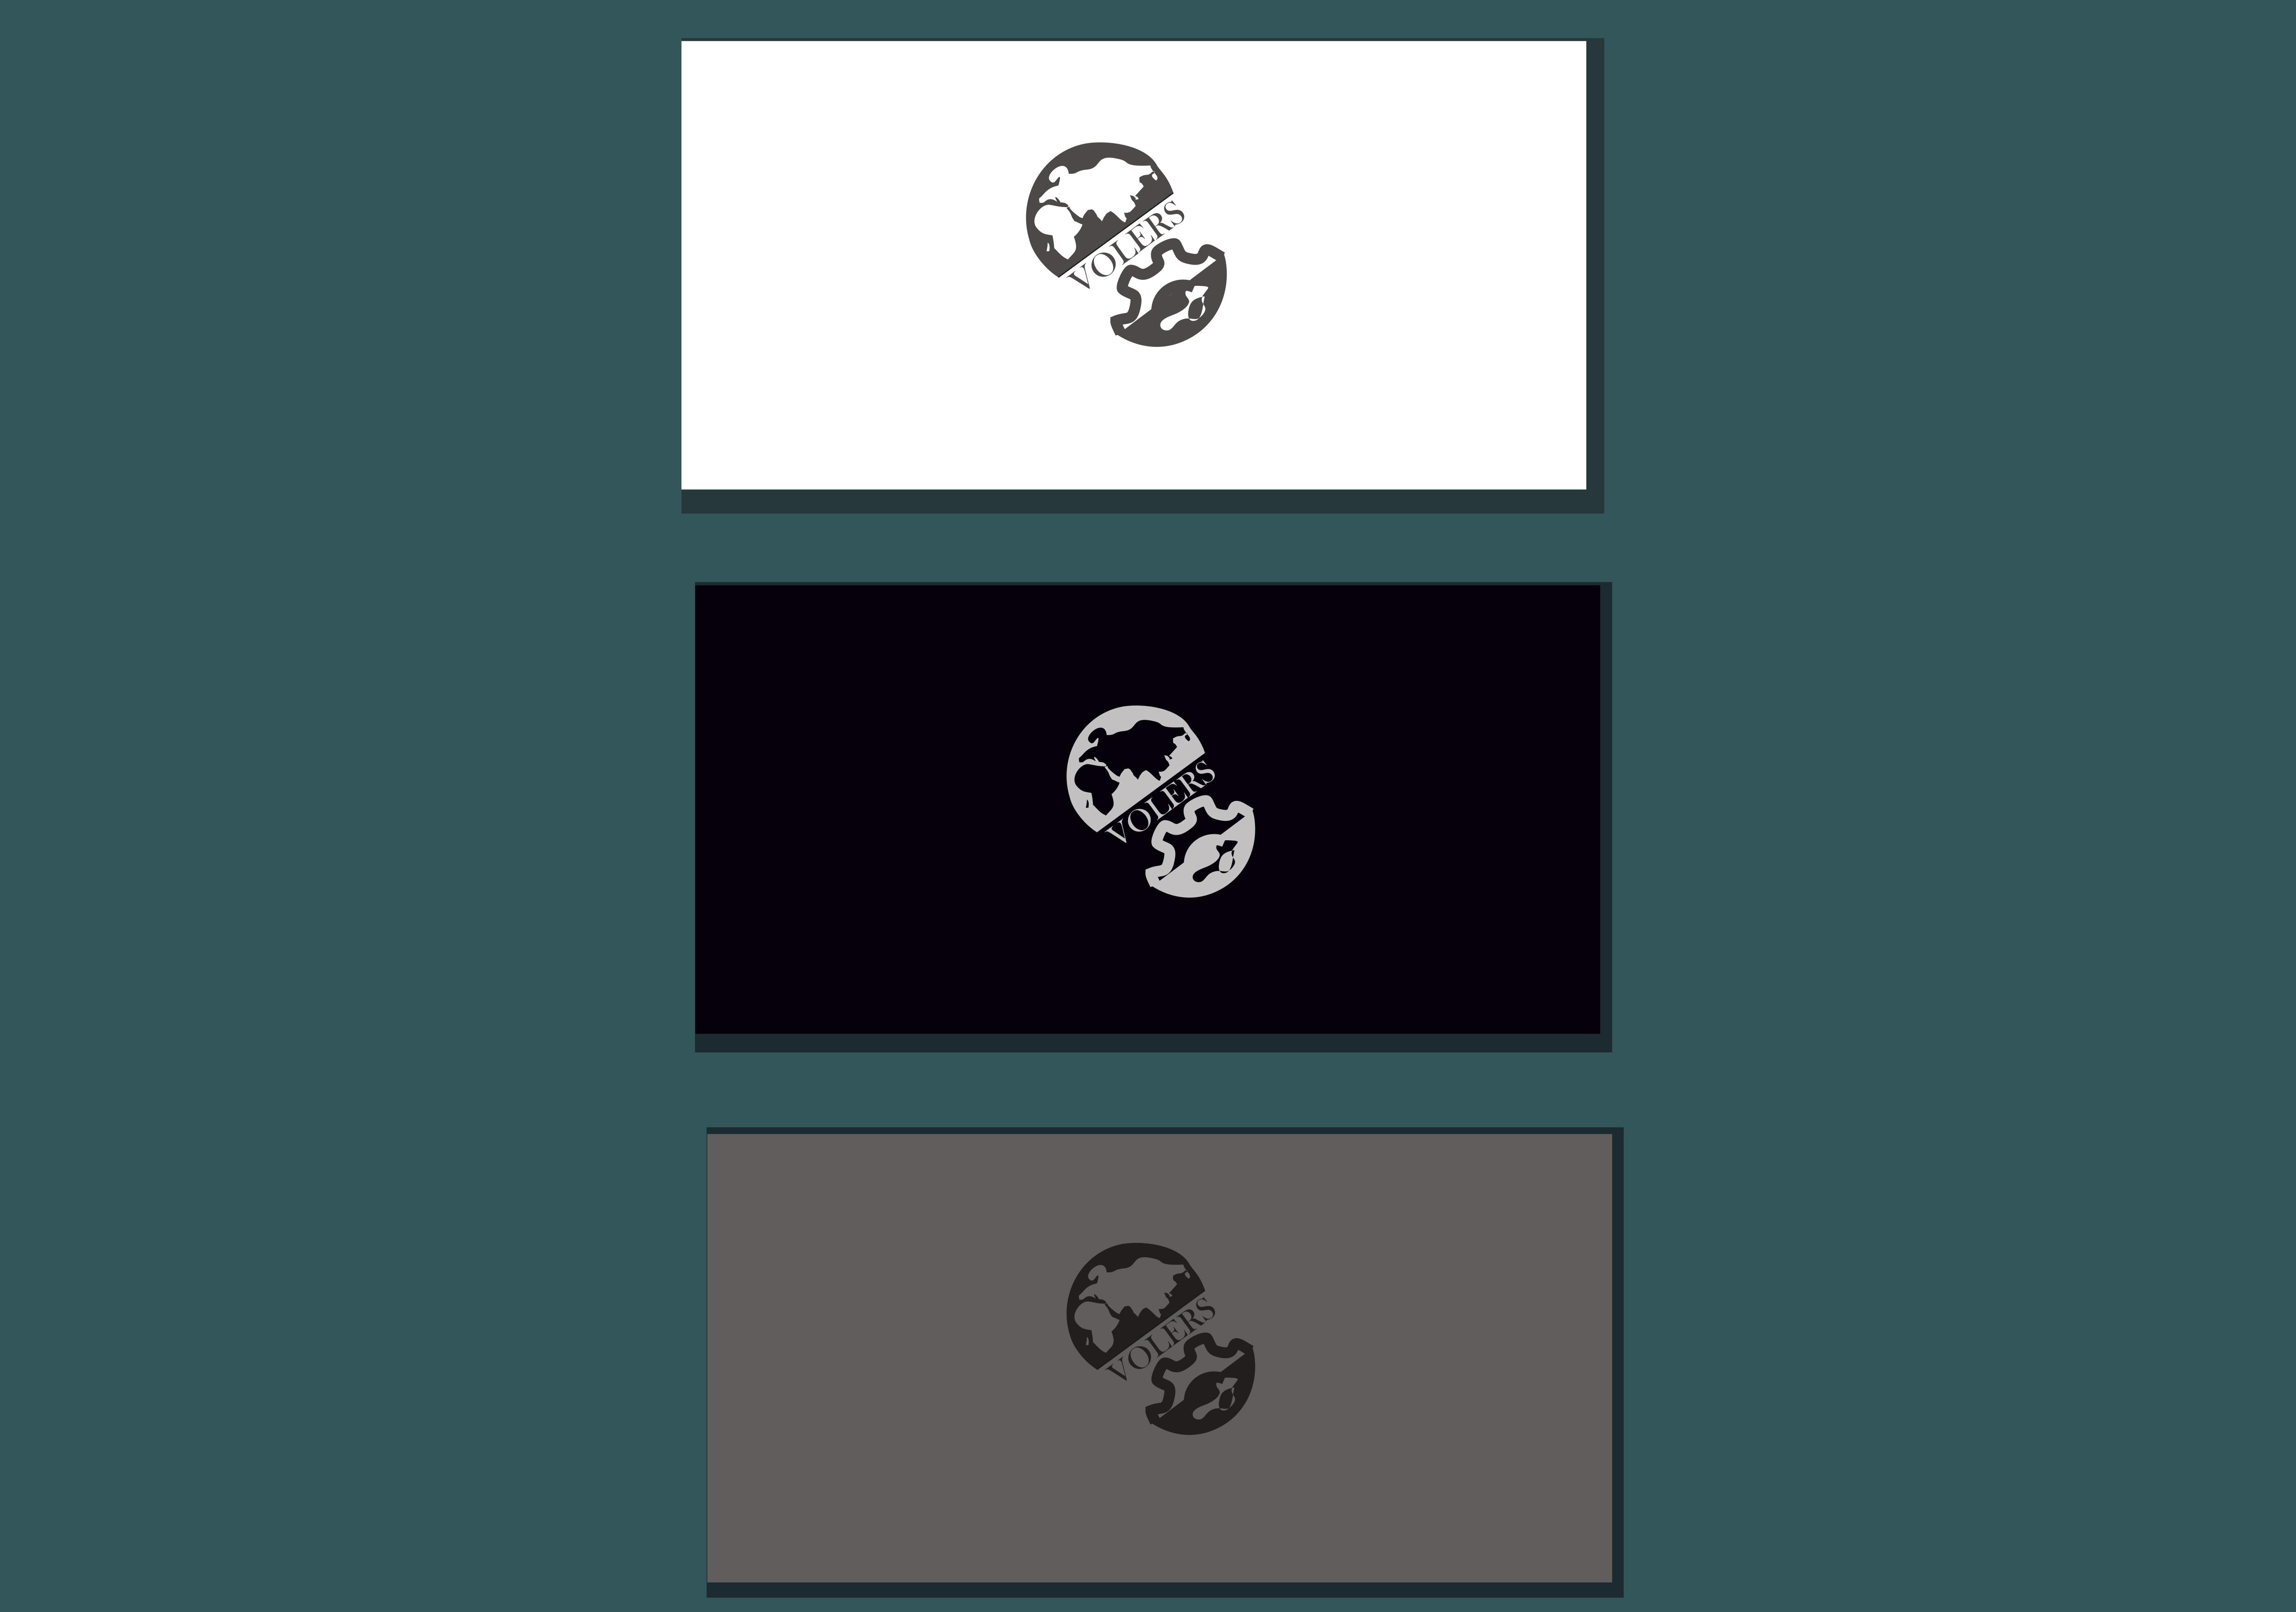 Обновить текущий логотип  фото f_5235d480ef2269d7.jpg